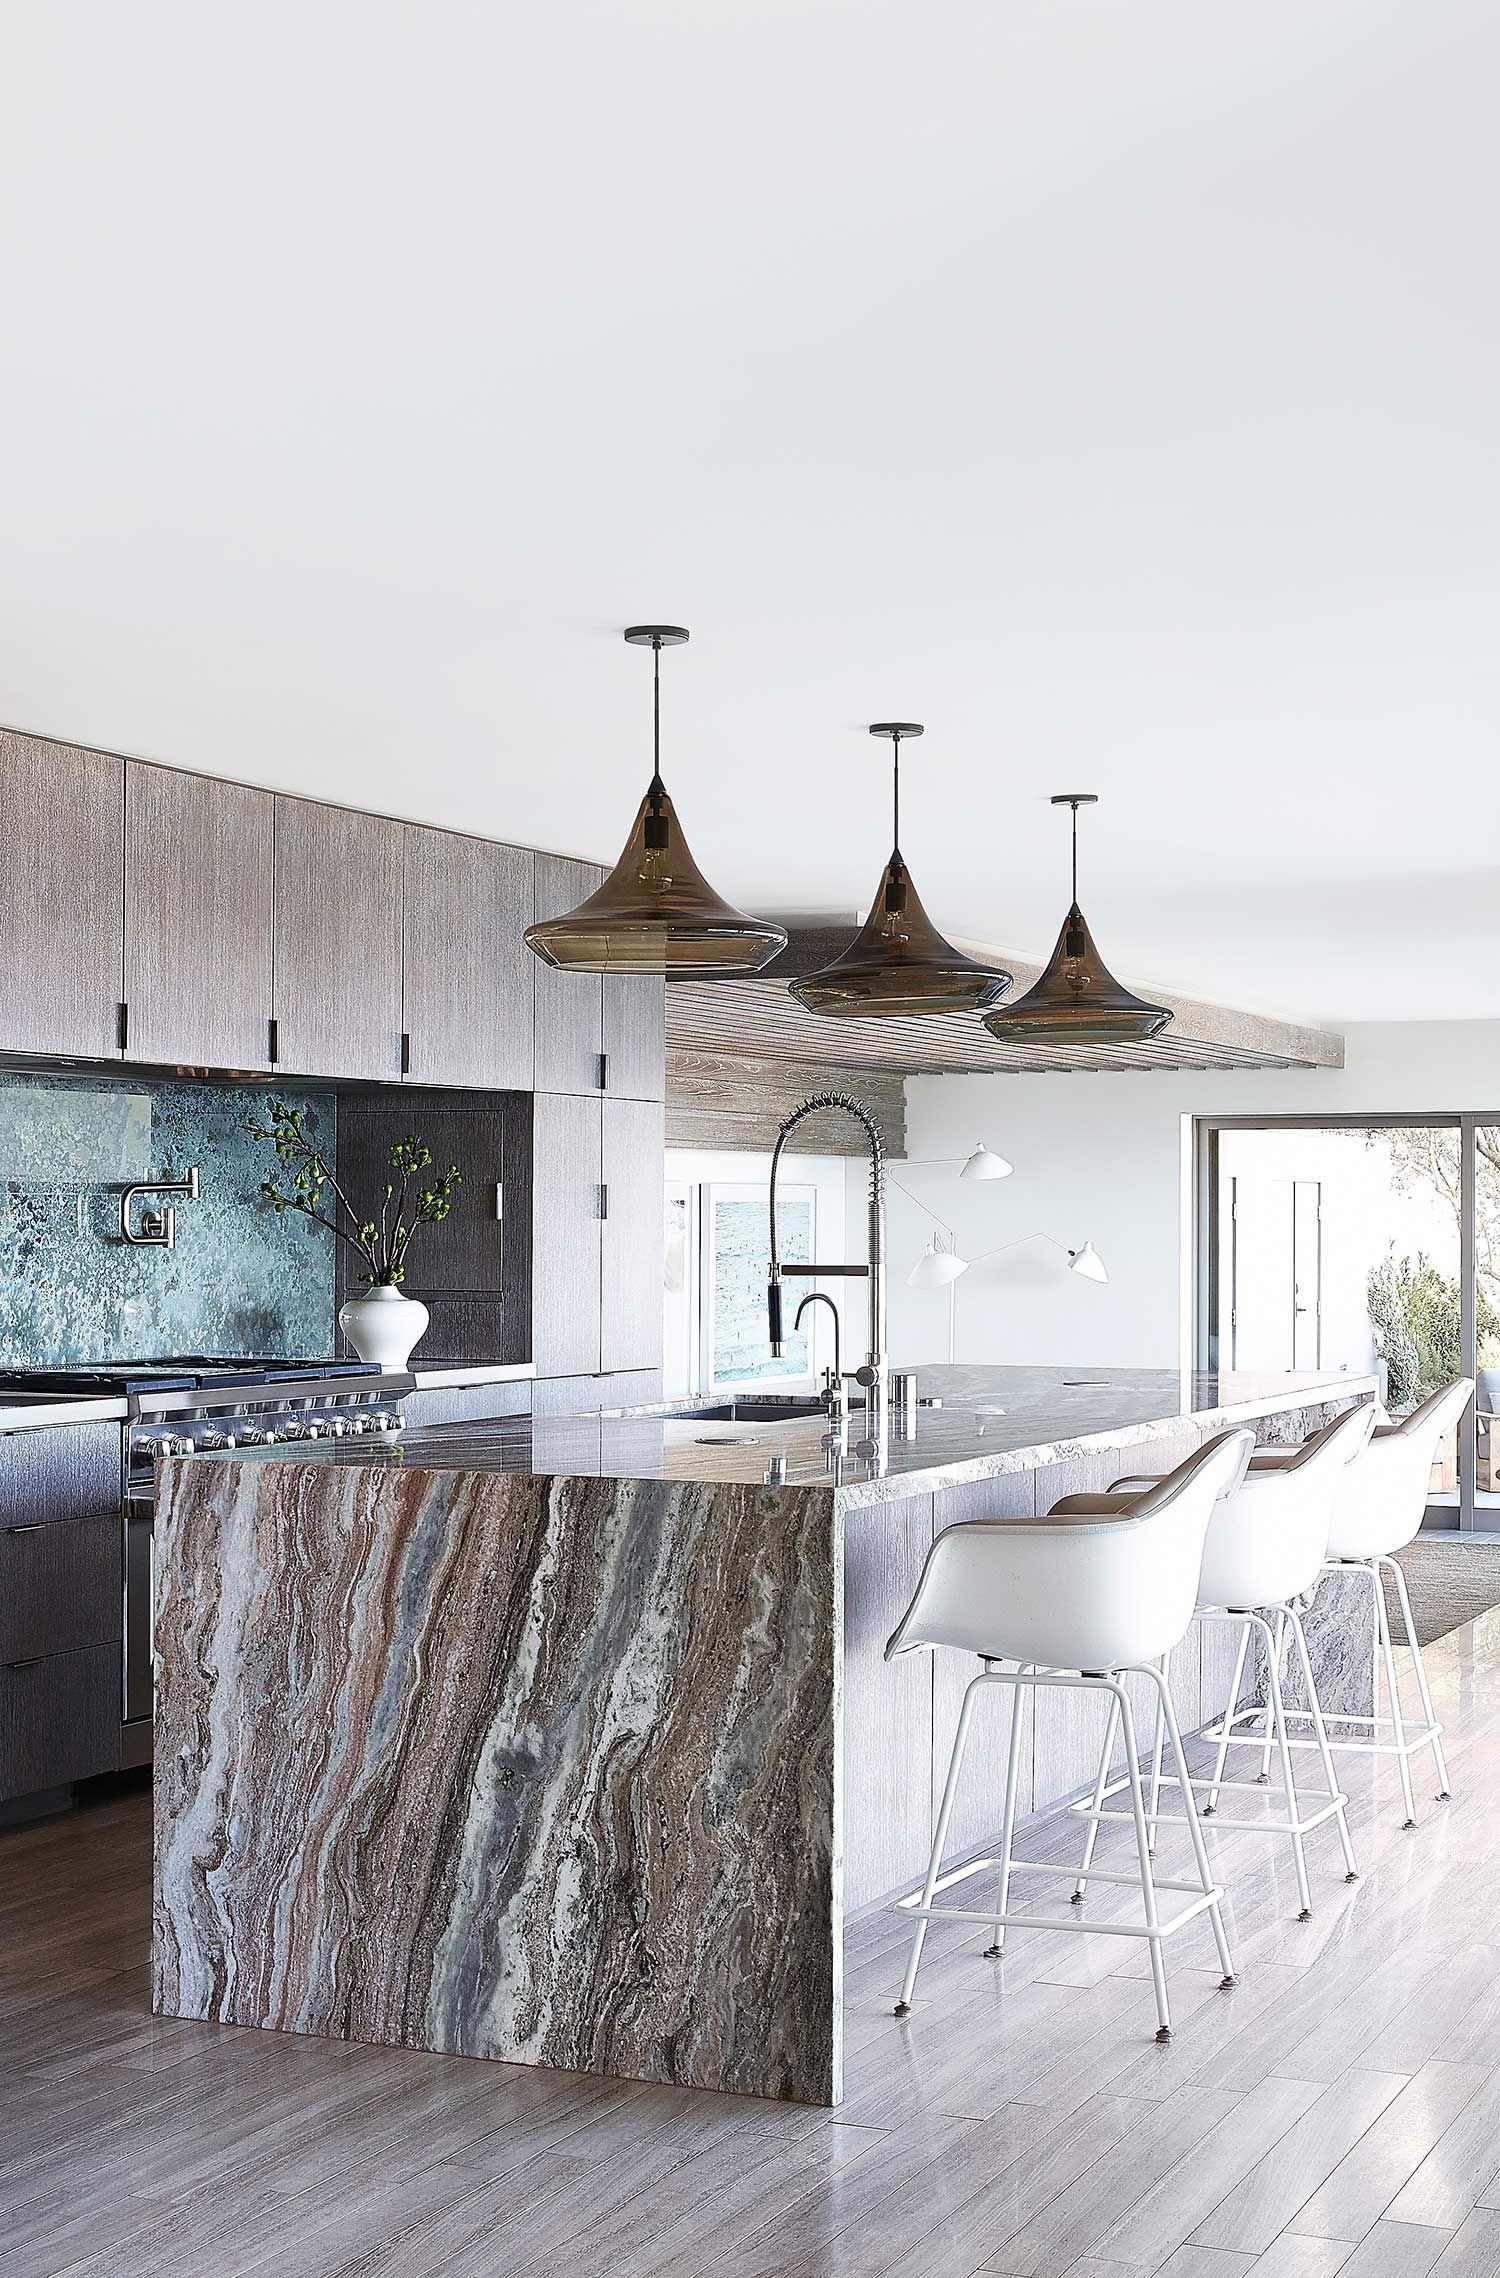 Prj seaside retreat jamie bush co contemporary interior